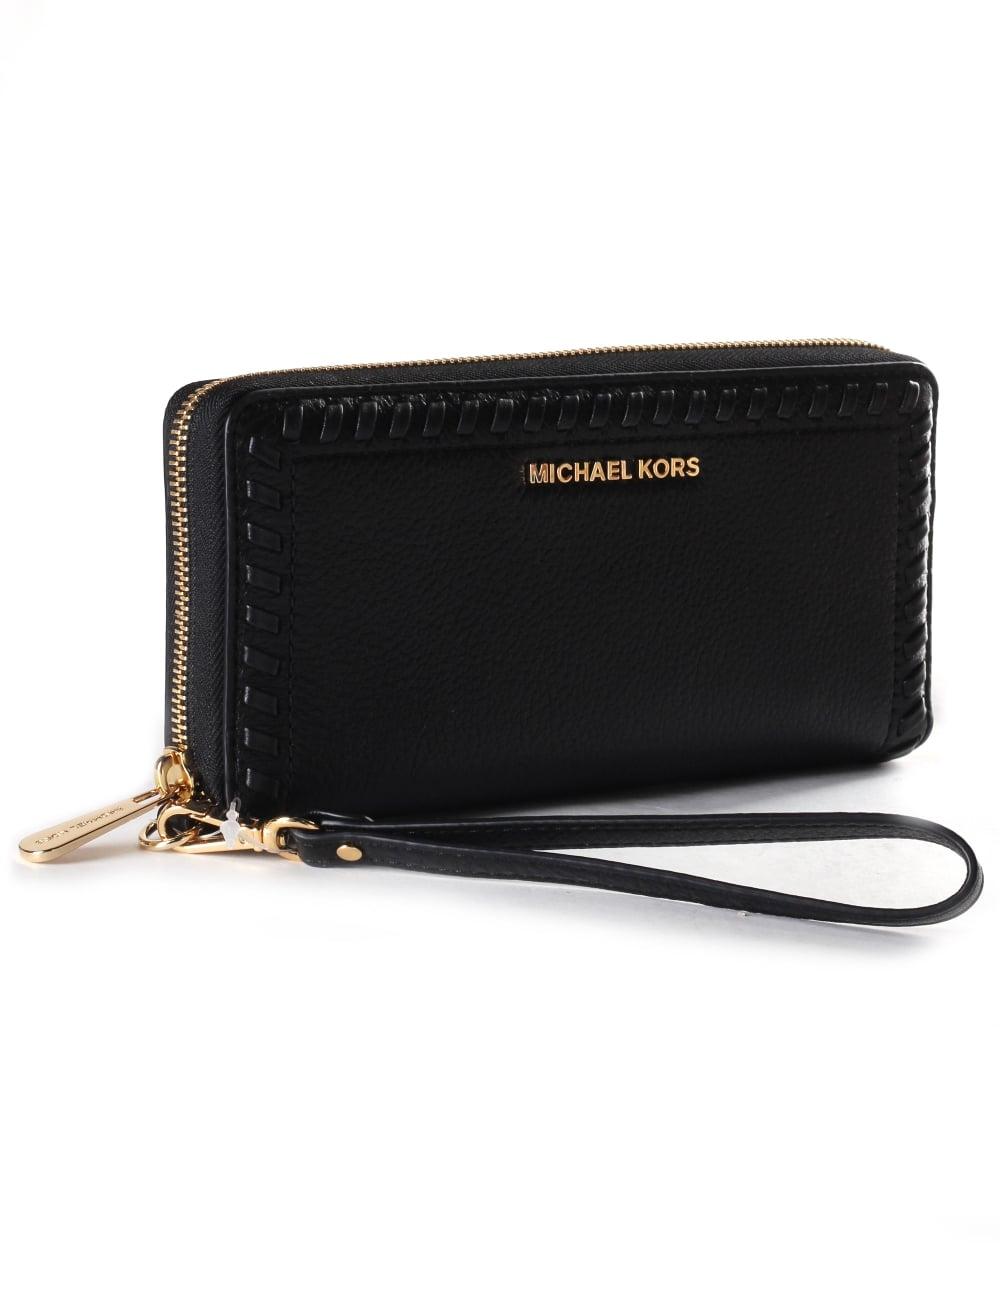 e9059f64e347de ... Women039s Lauryn Travel Continental Wristlet Wallet Michael kors ...